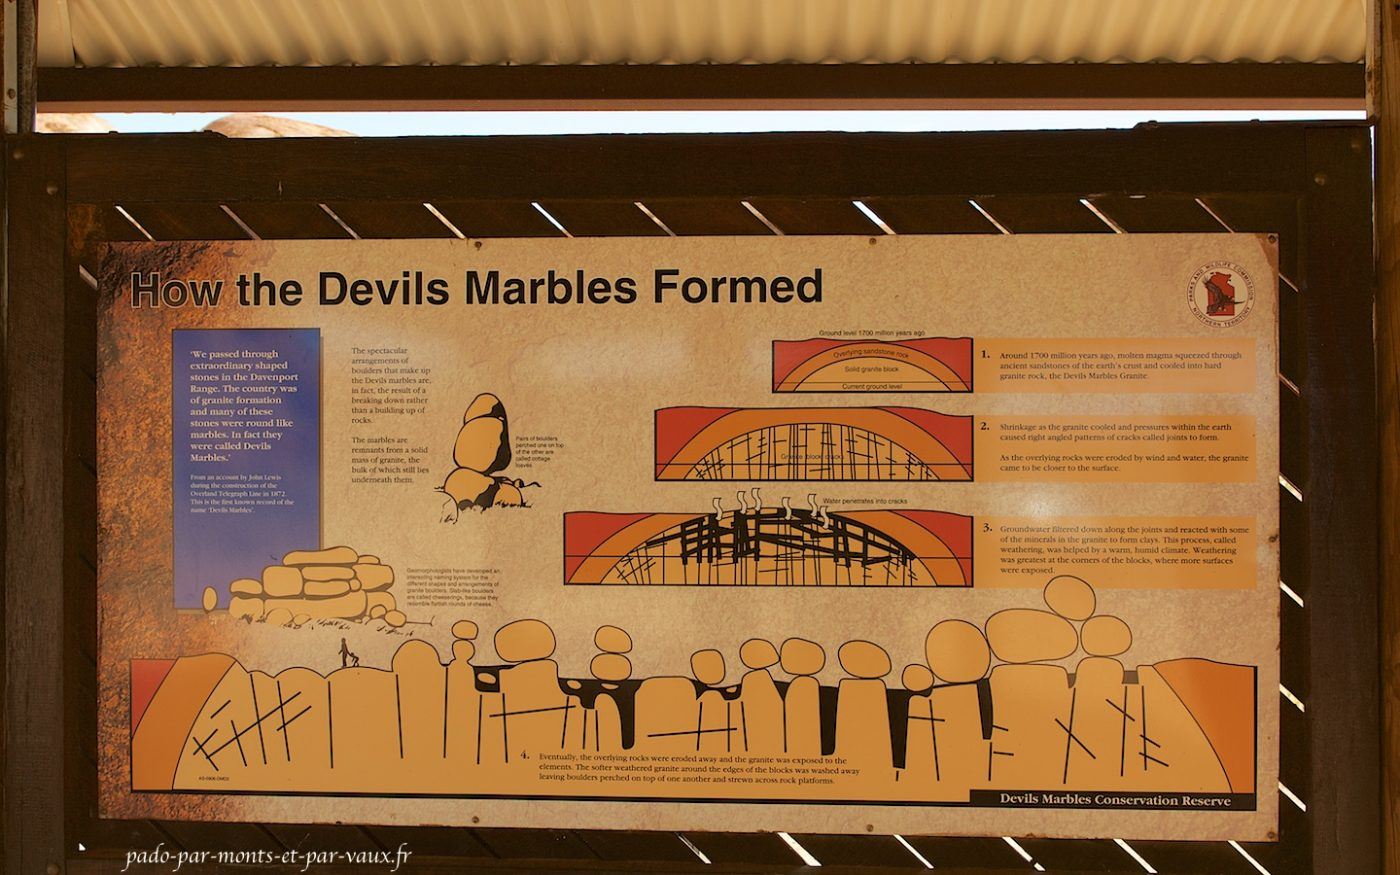 Devils Marbles